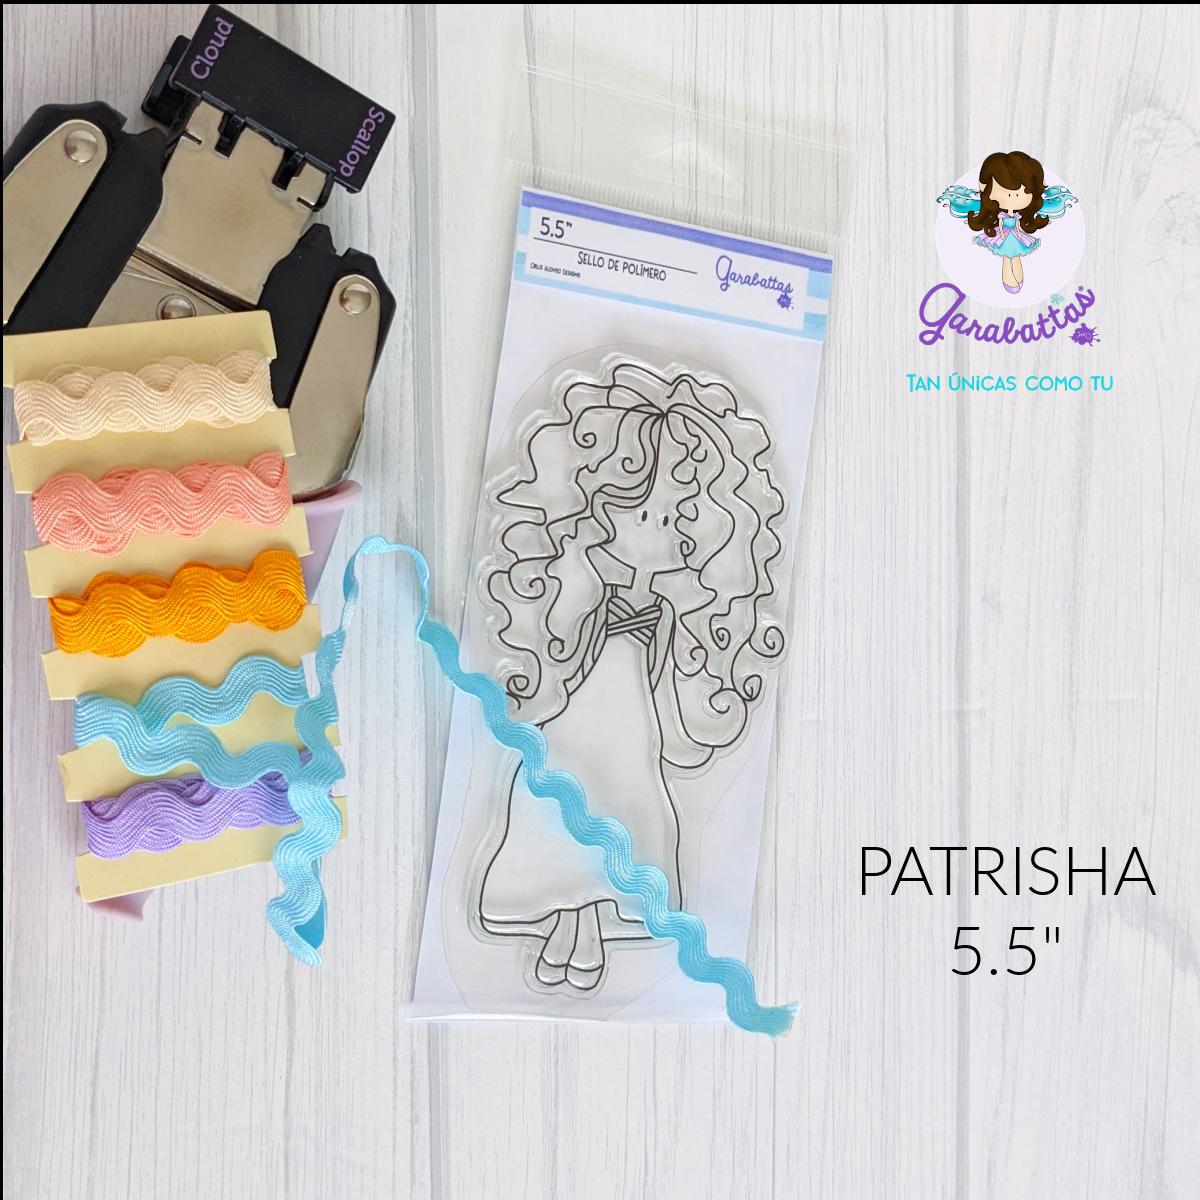 "Clear Stamp 5.5"" PATRISHA"